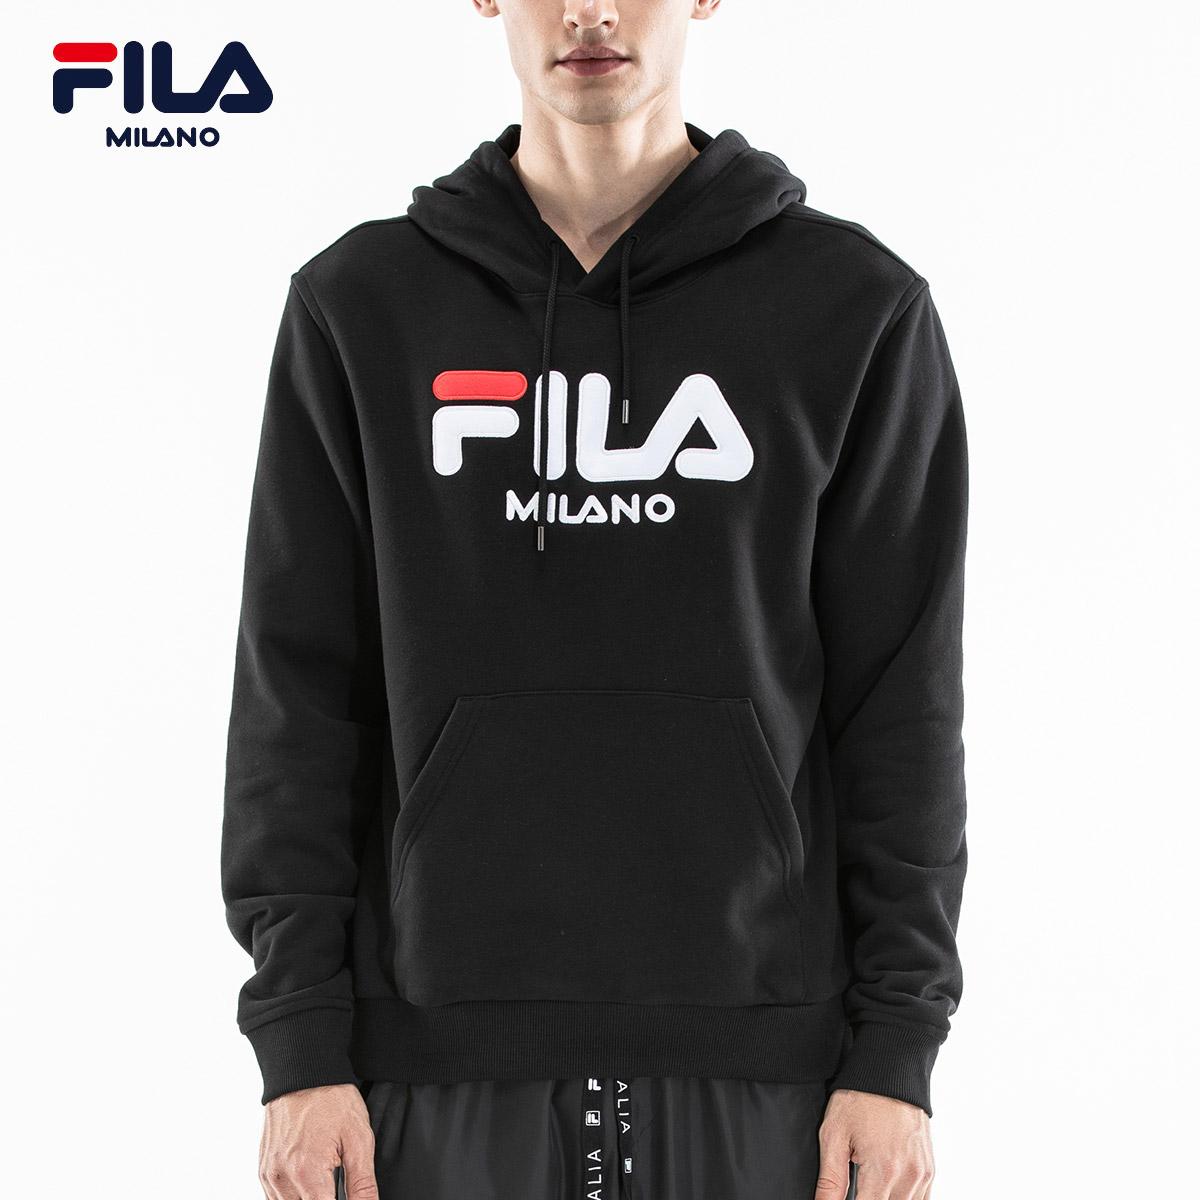 FILA米兰时装周ICONIC系列SNBN限定款 男子针织连帽卫衣